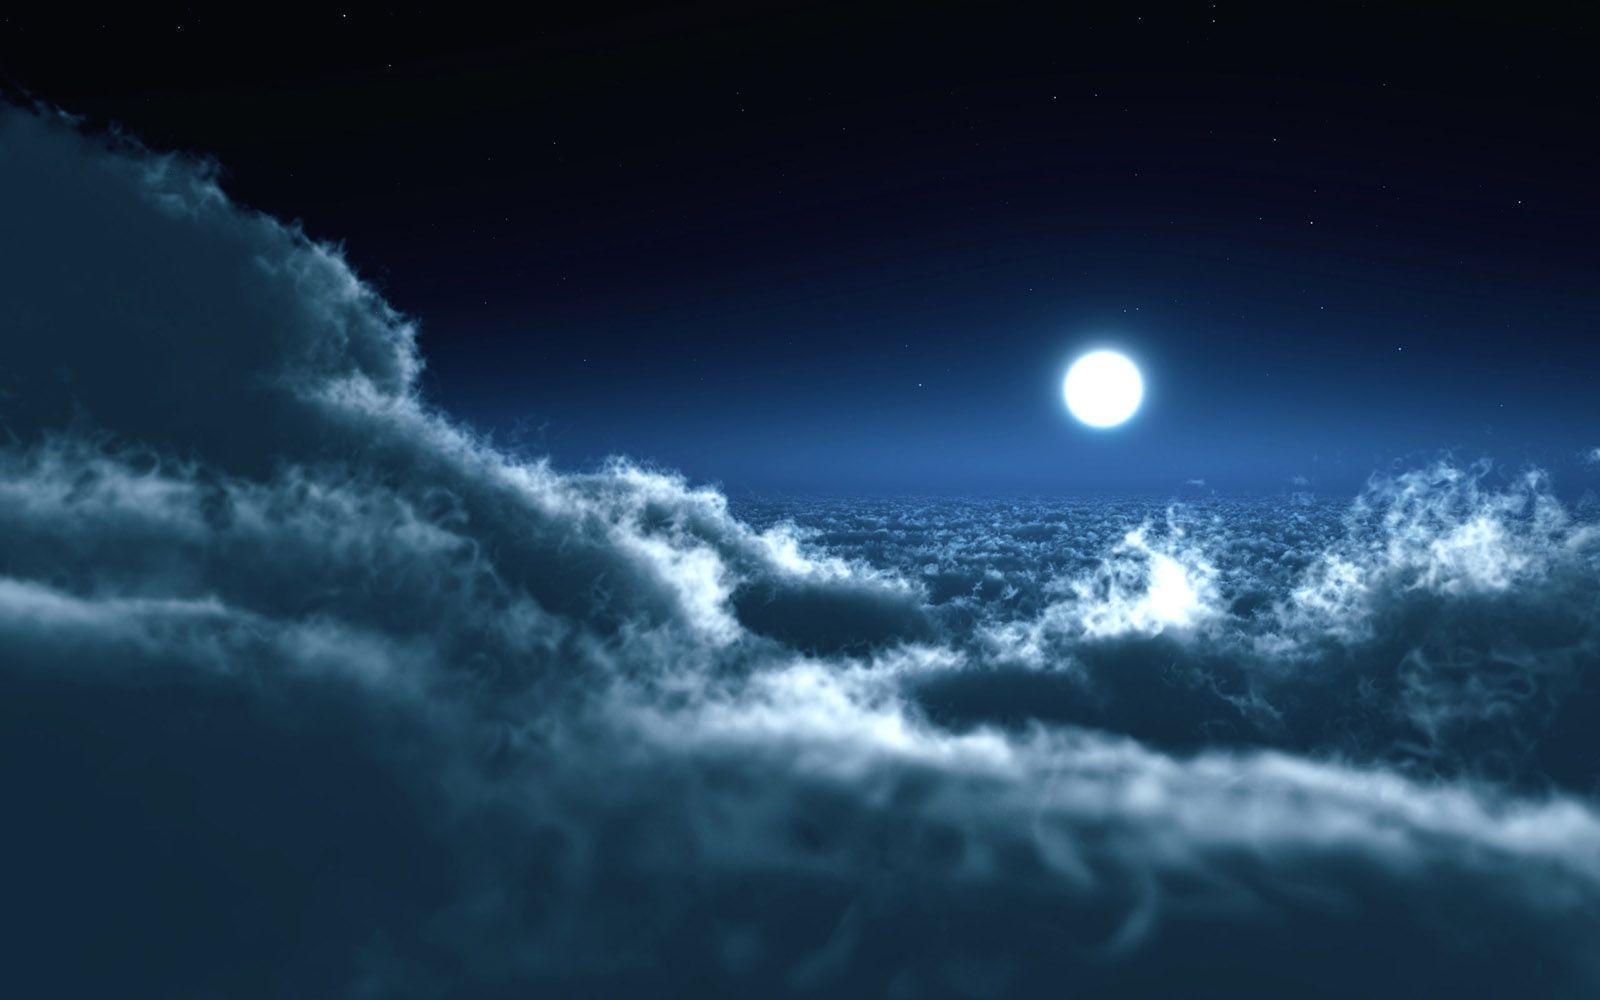 Full Moon at Night wallpaper - Nature Wallpapers